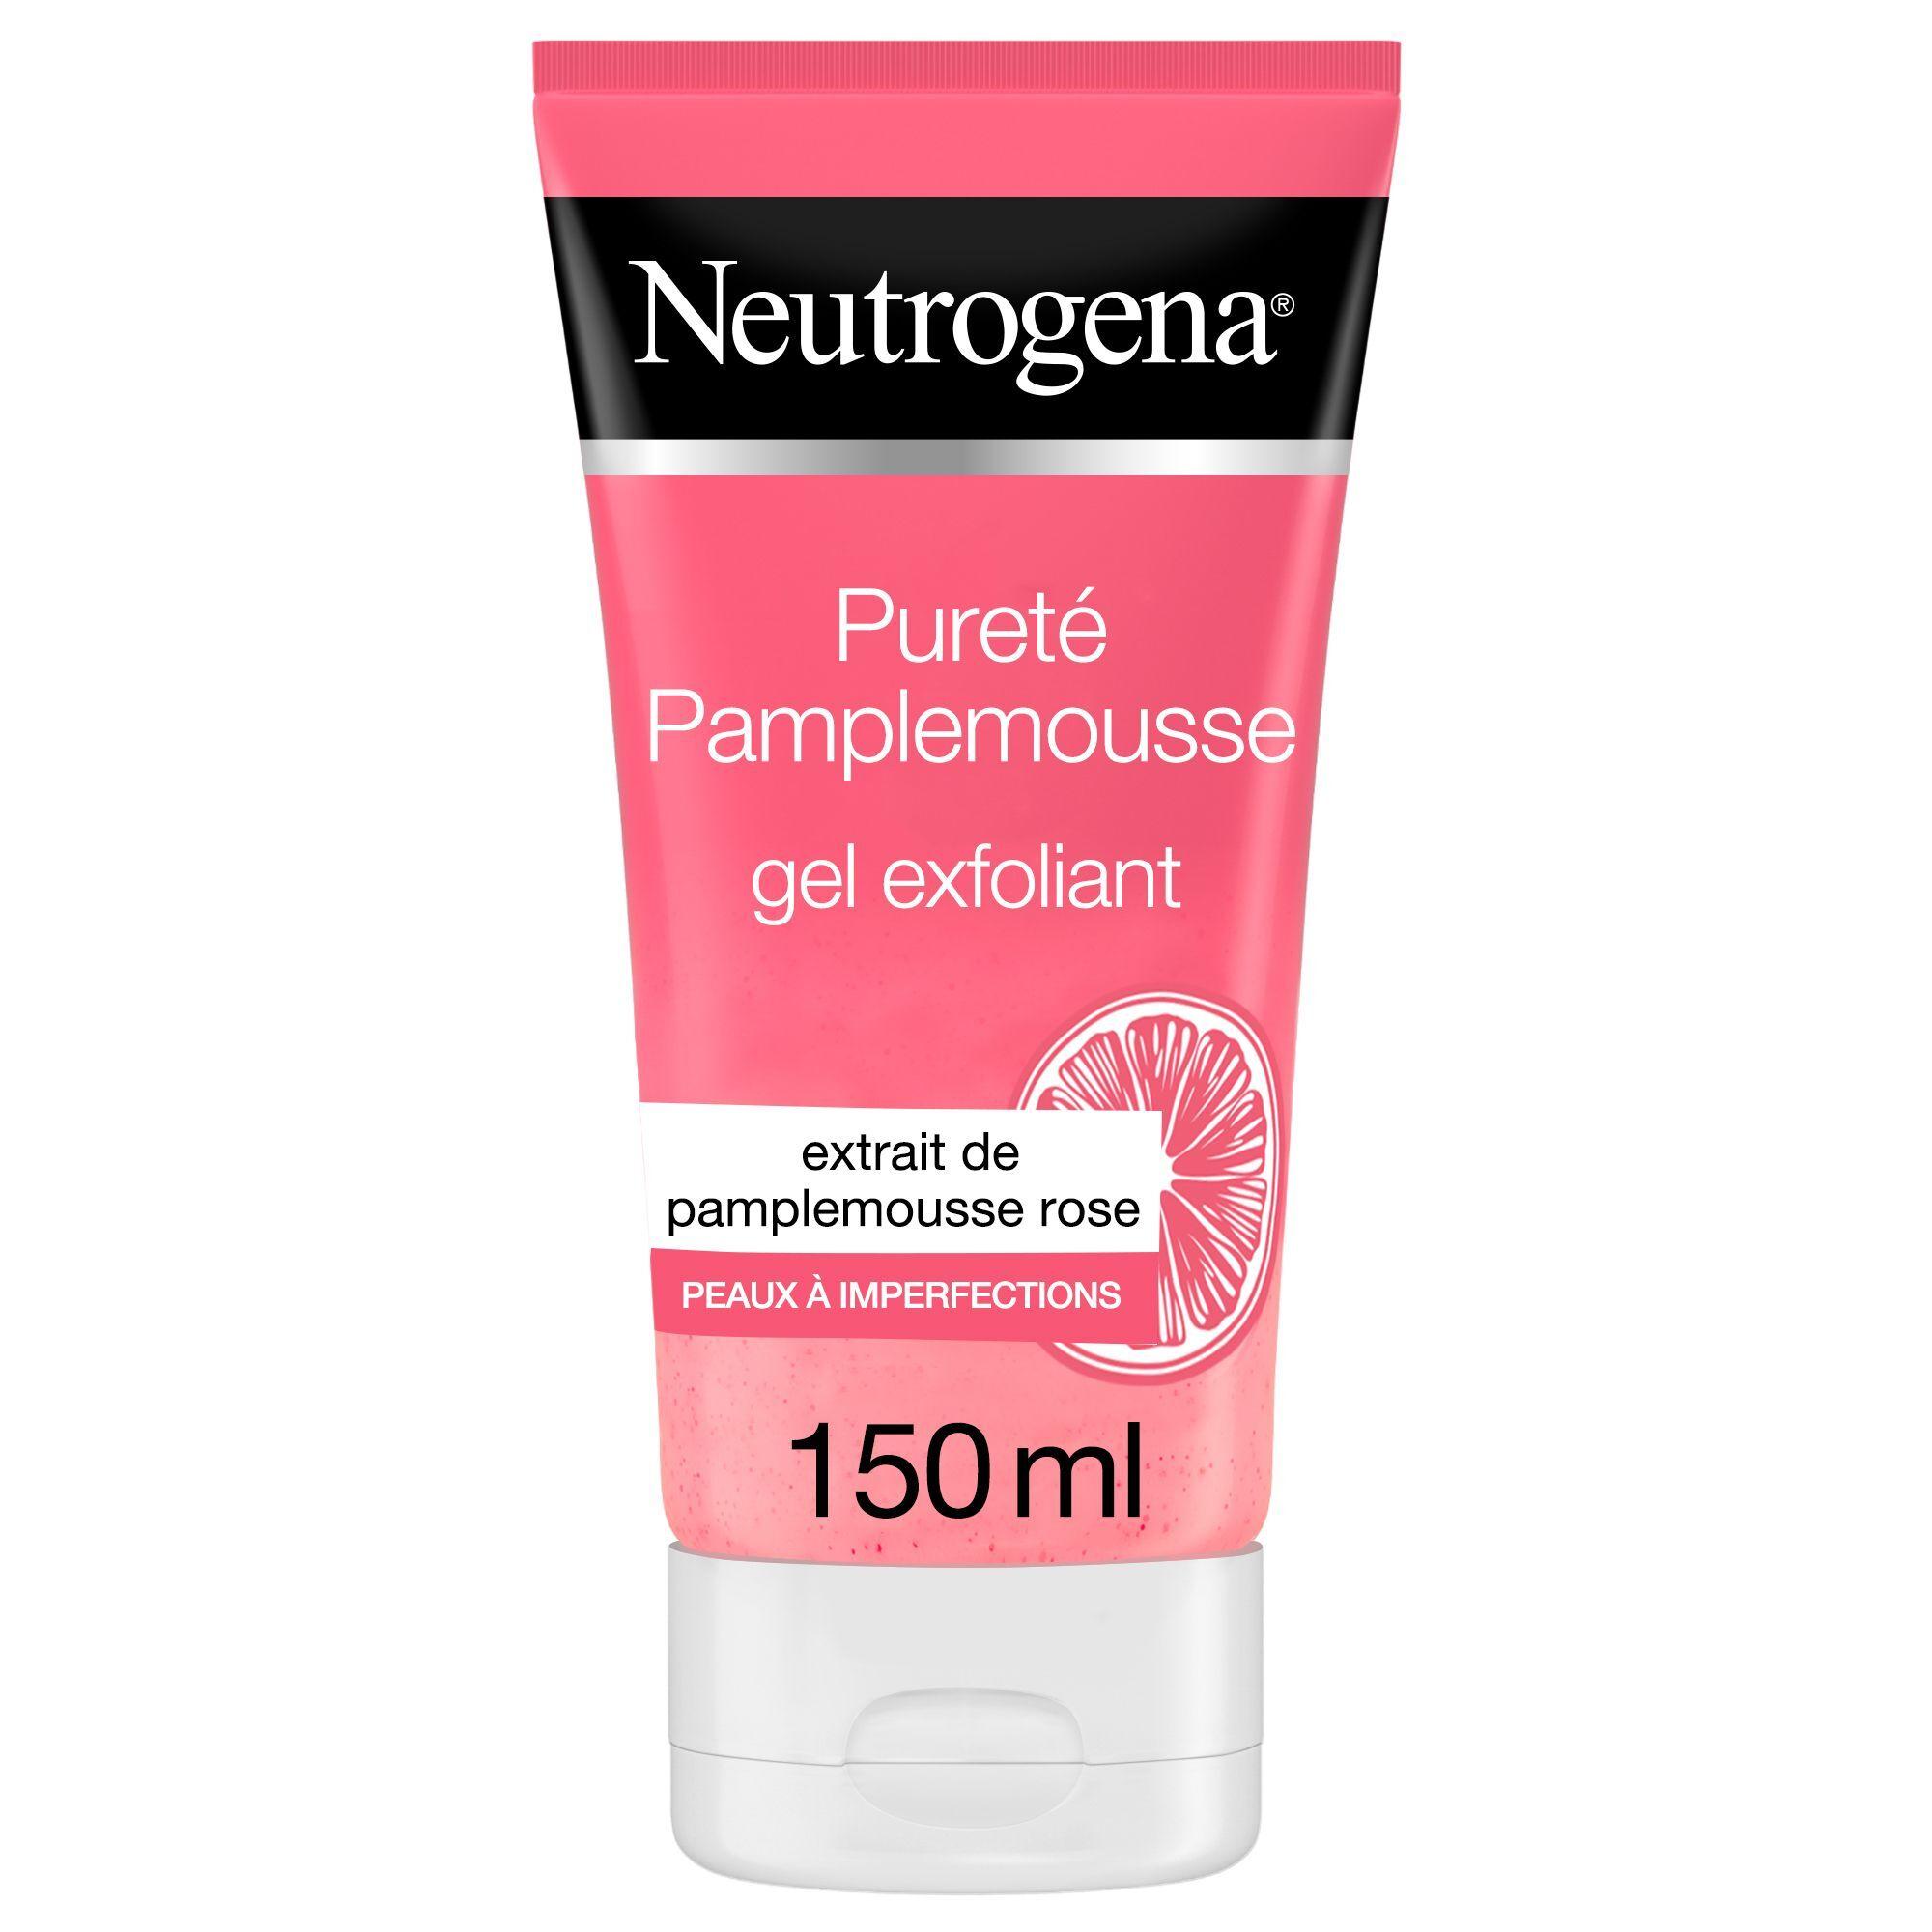 Neutrogena® Neutrogena Gel Exfoliant au Pamplemousse Rose, Anti-Imperfections, Peaux normales à grasses - Tube 150 ml ml gel(s)